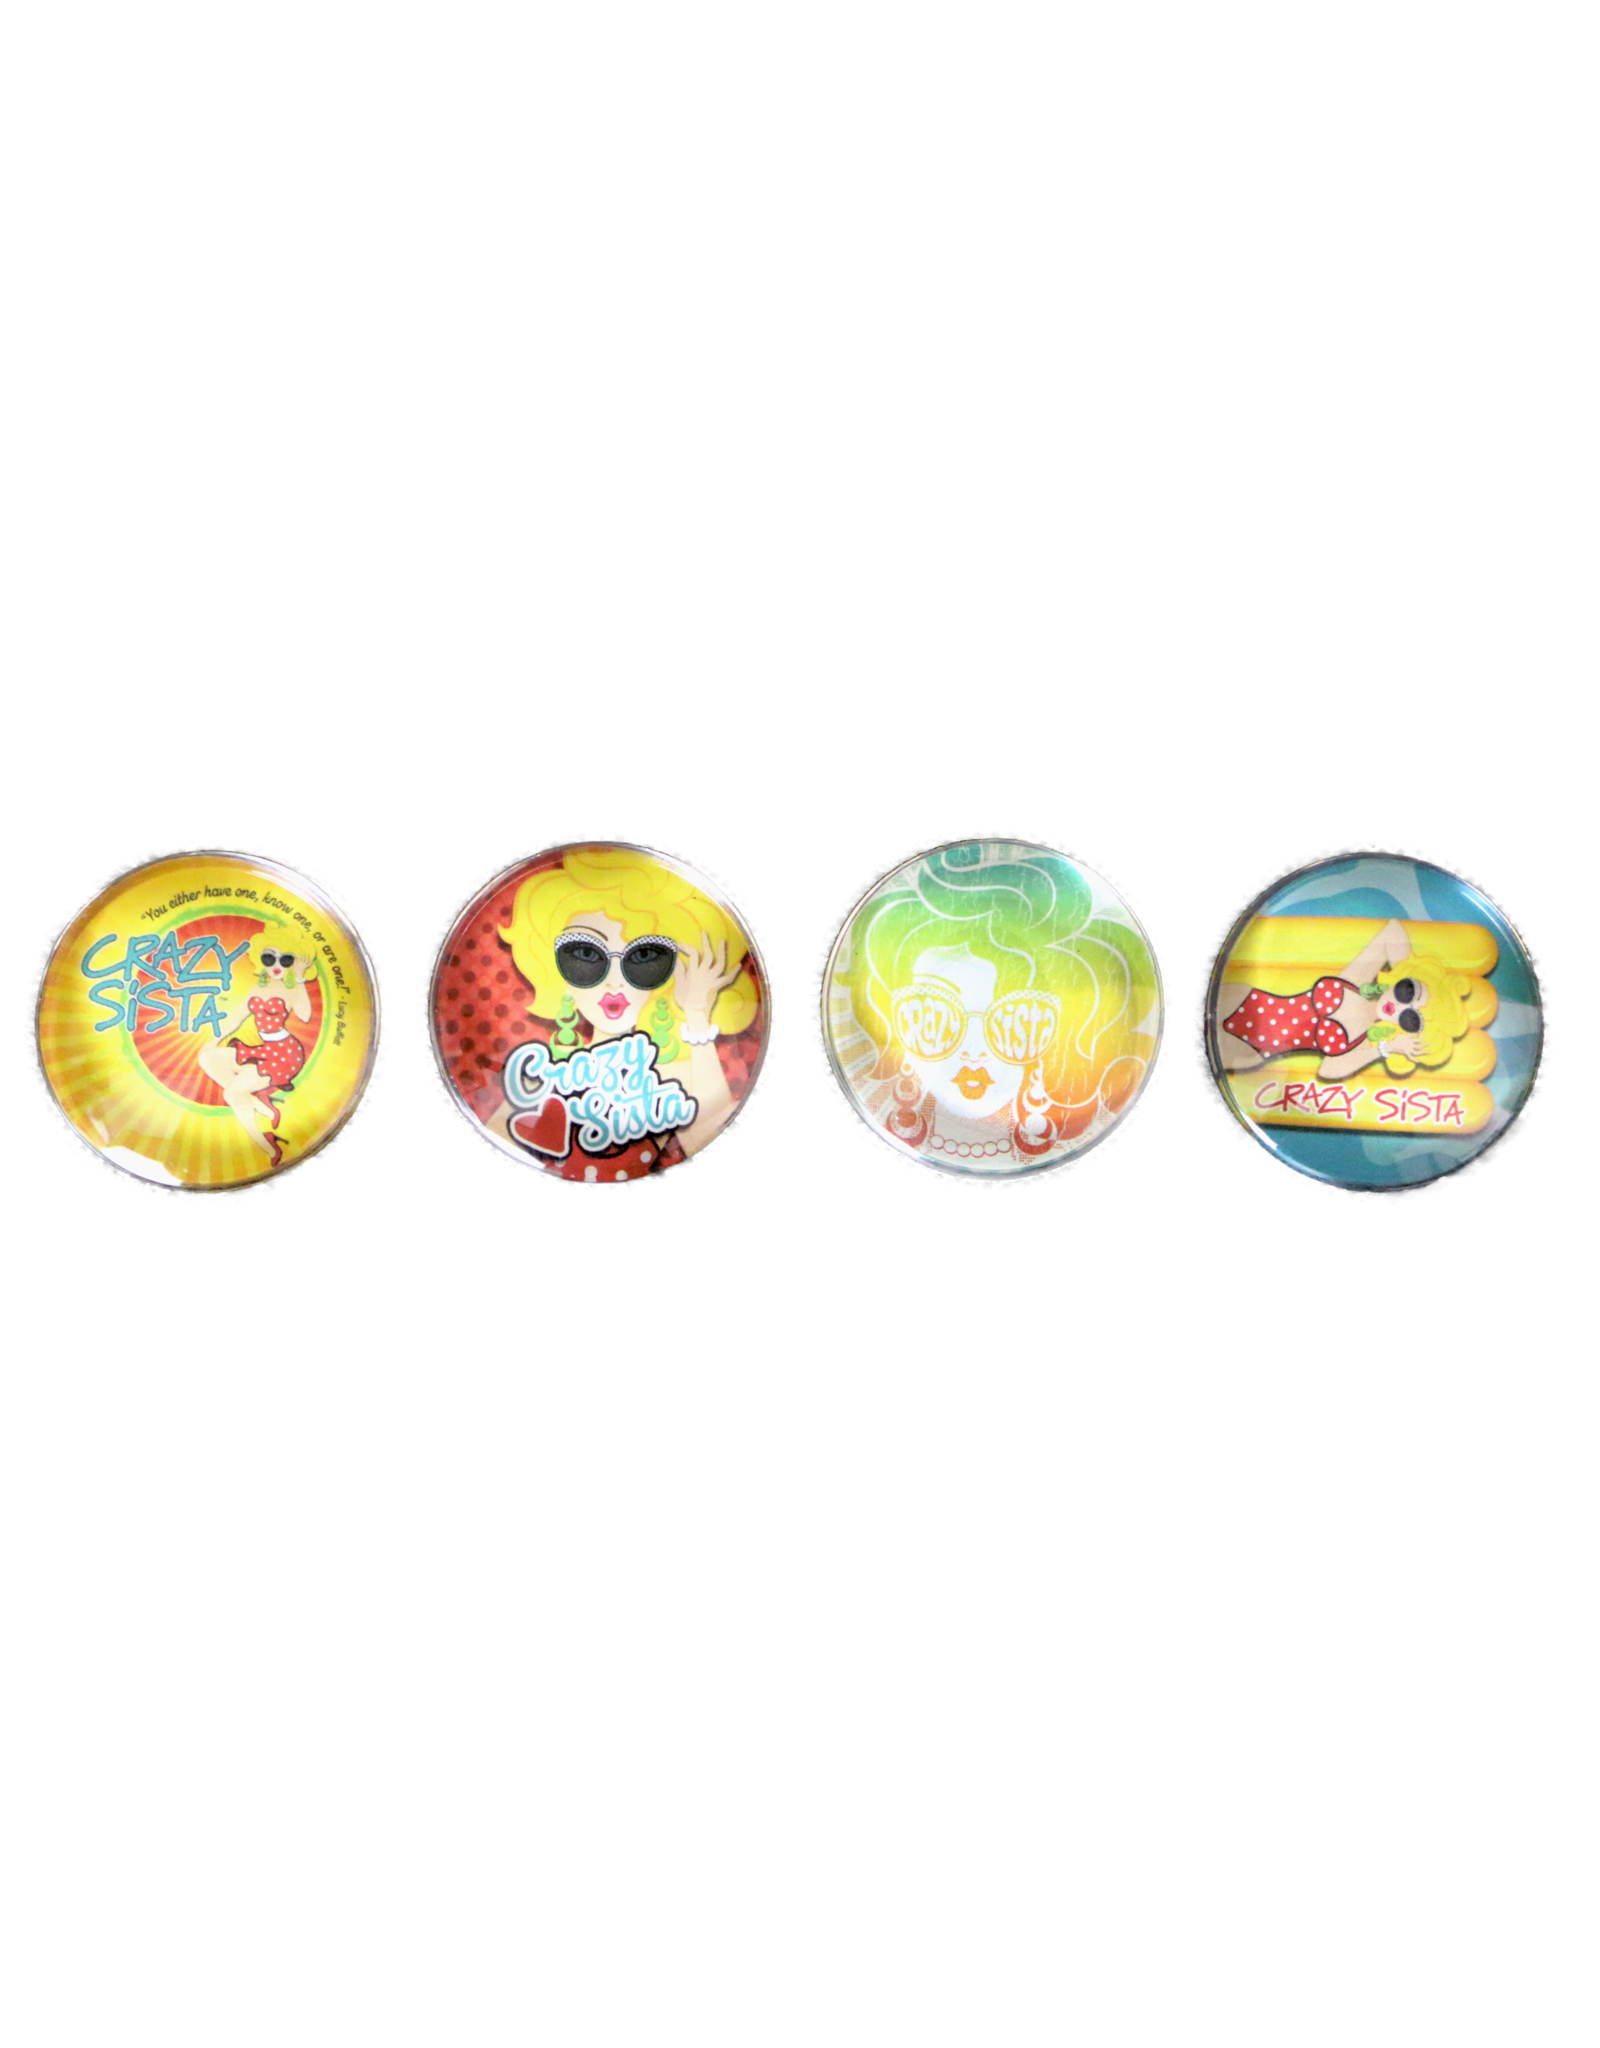 Crazy Sista Crazy Sista 4 Pack/Single Magnet